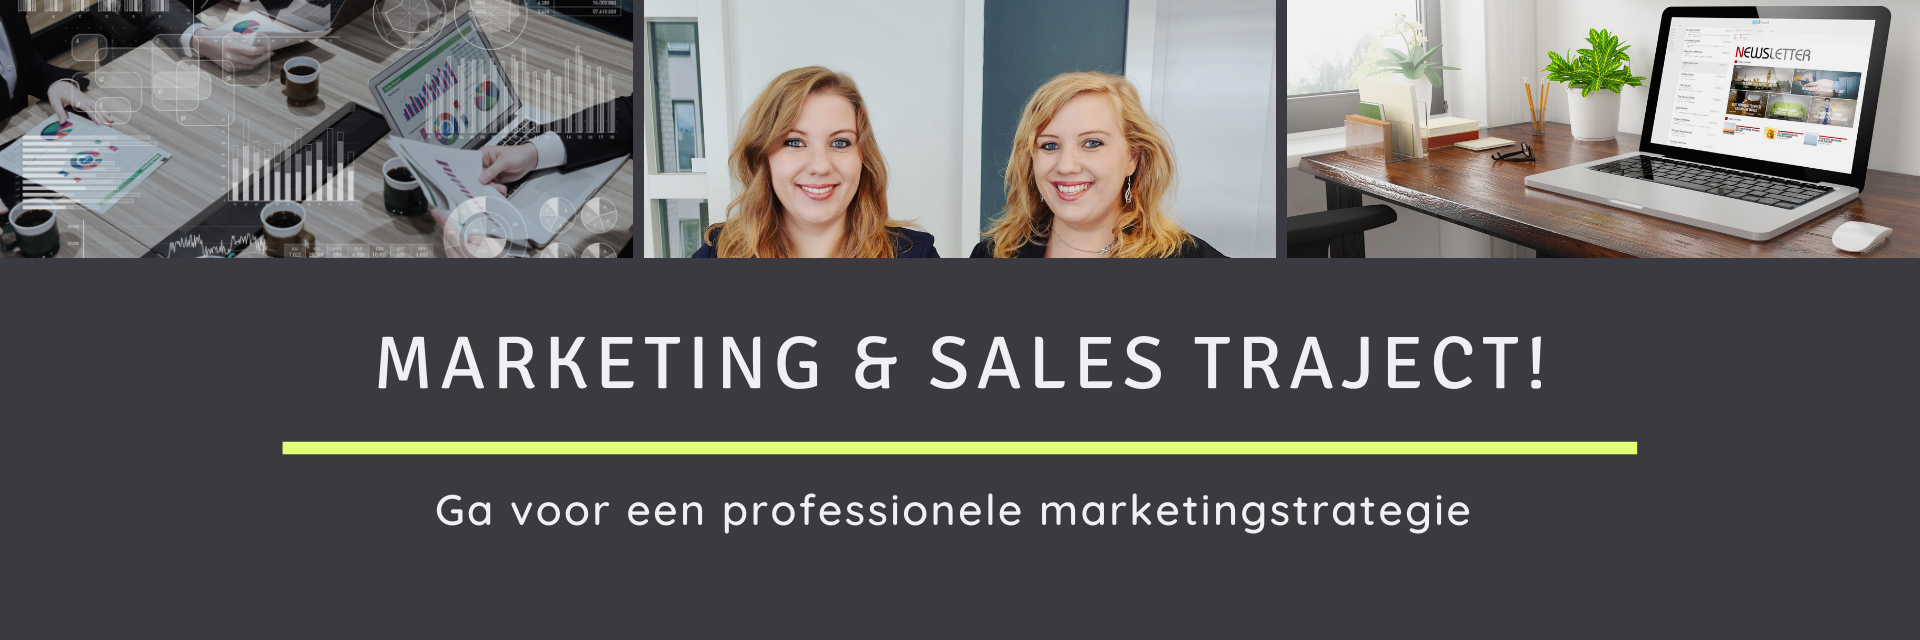 Marketing Sales Traject